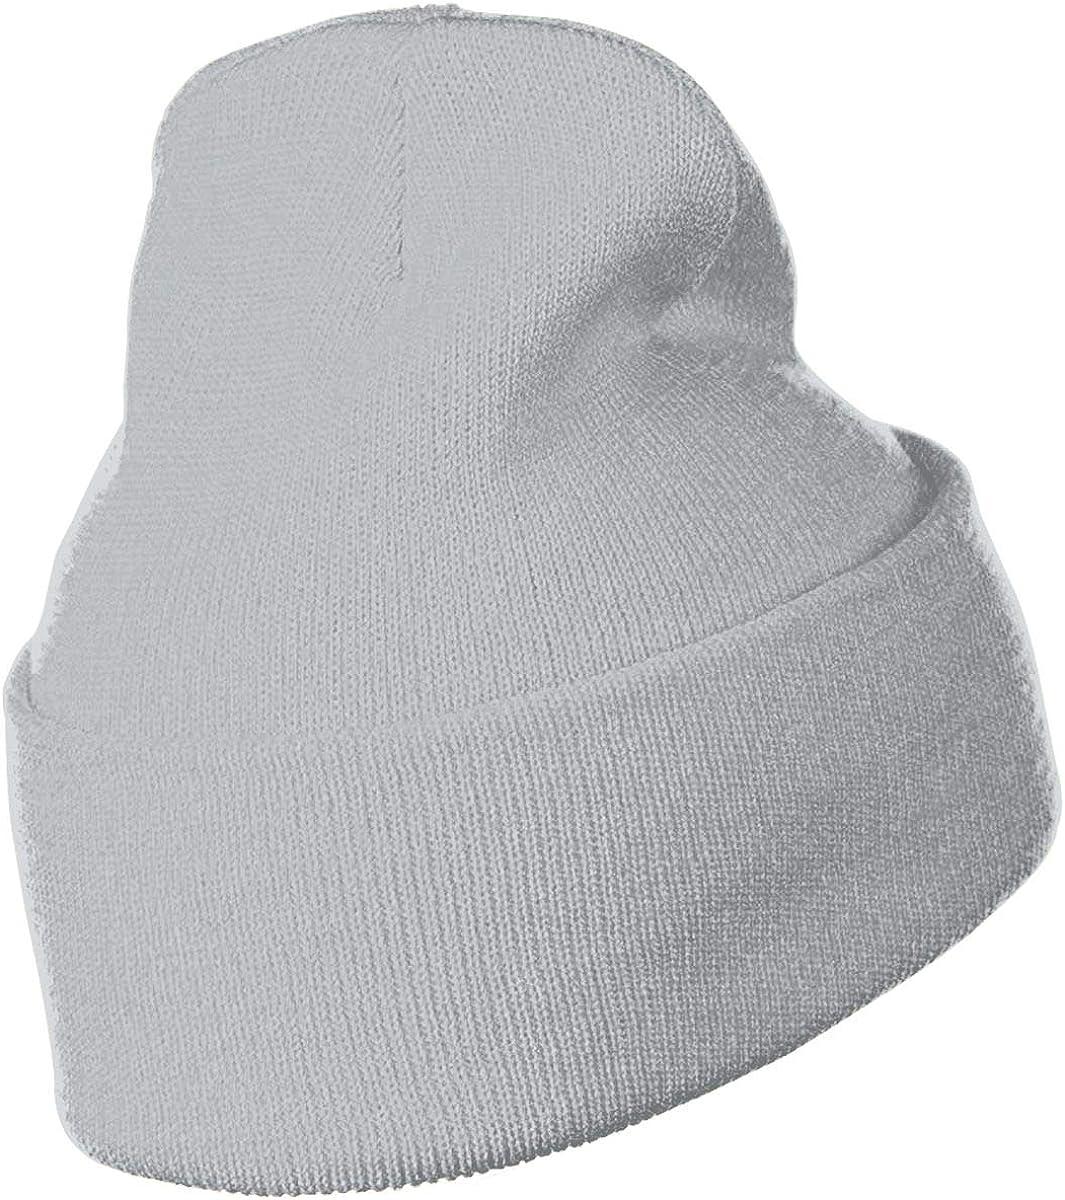 Unisex Winter Hats Markiplier /& Jack Septic Eye Merchandise Leisure Skull Caps Knit Hat Cap Beanie Cap for Men//Womens